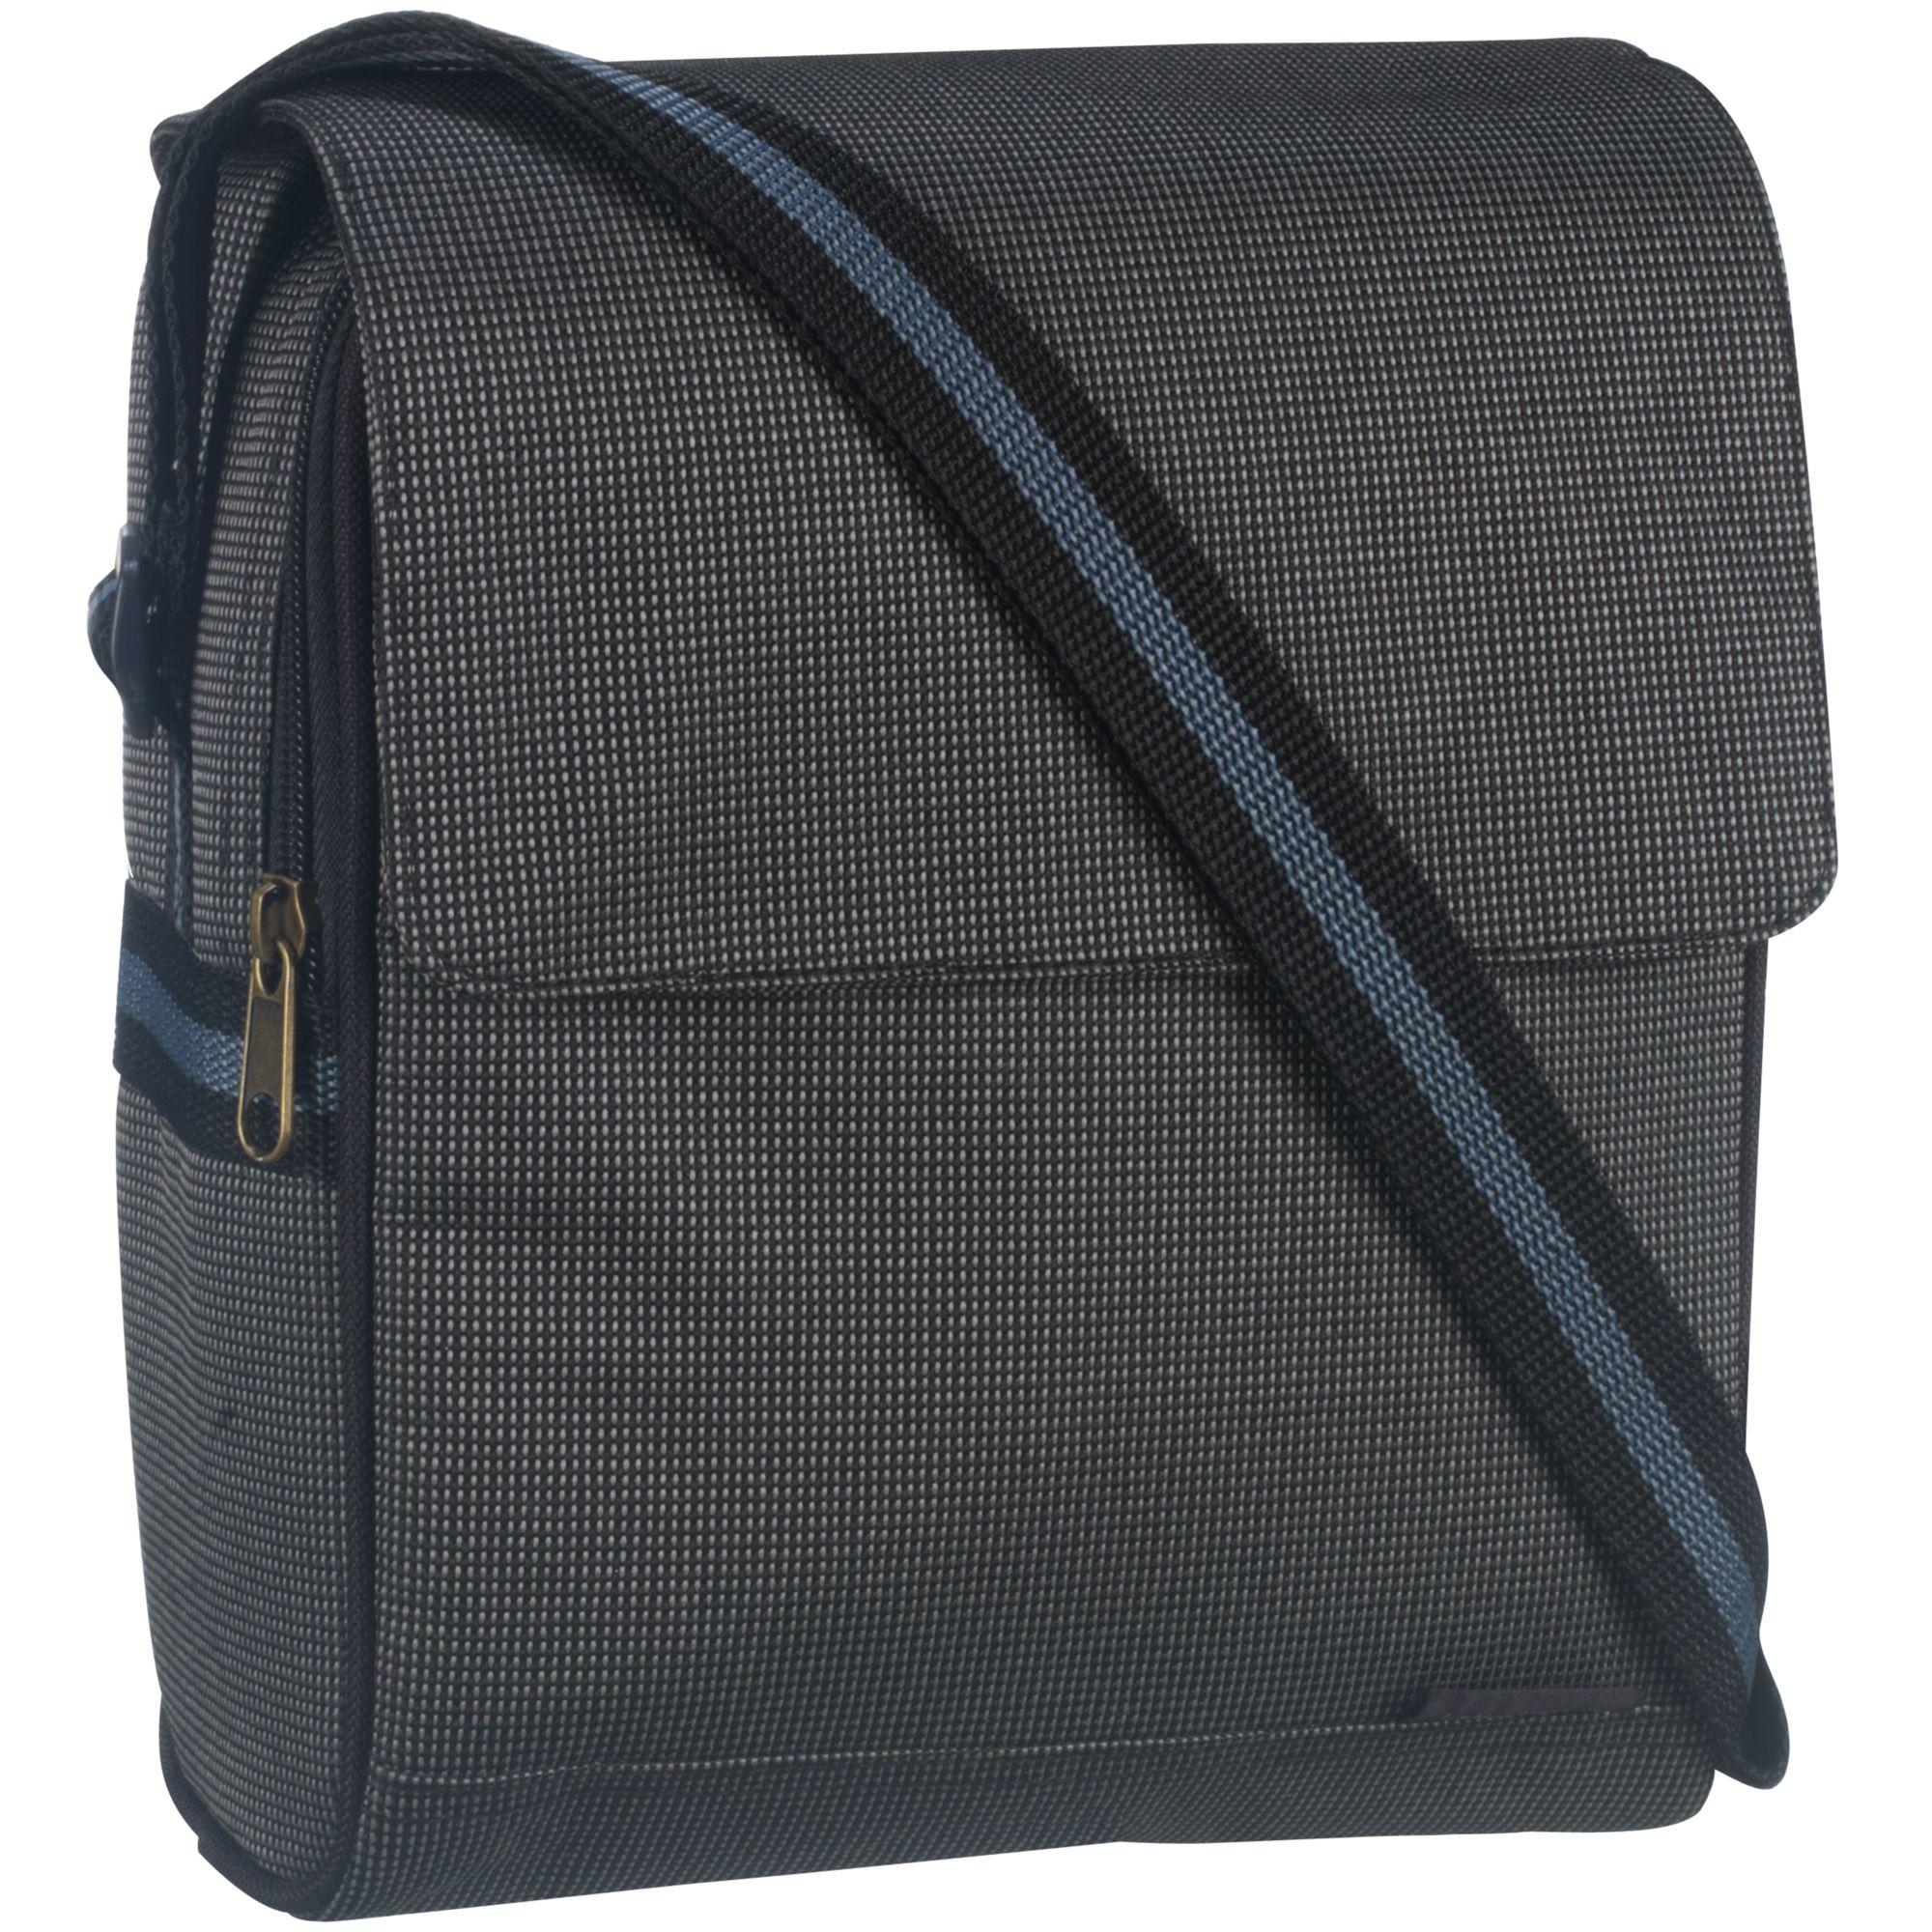 John Lewis Personal Satchel Cooler Bag